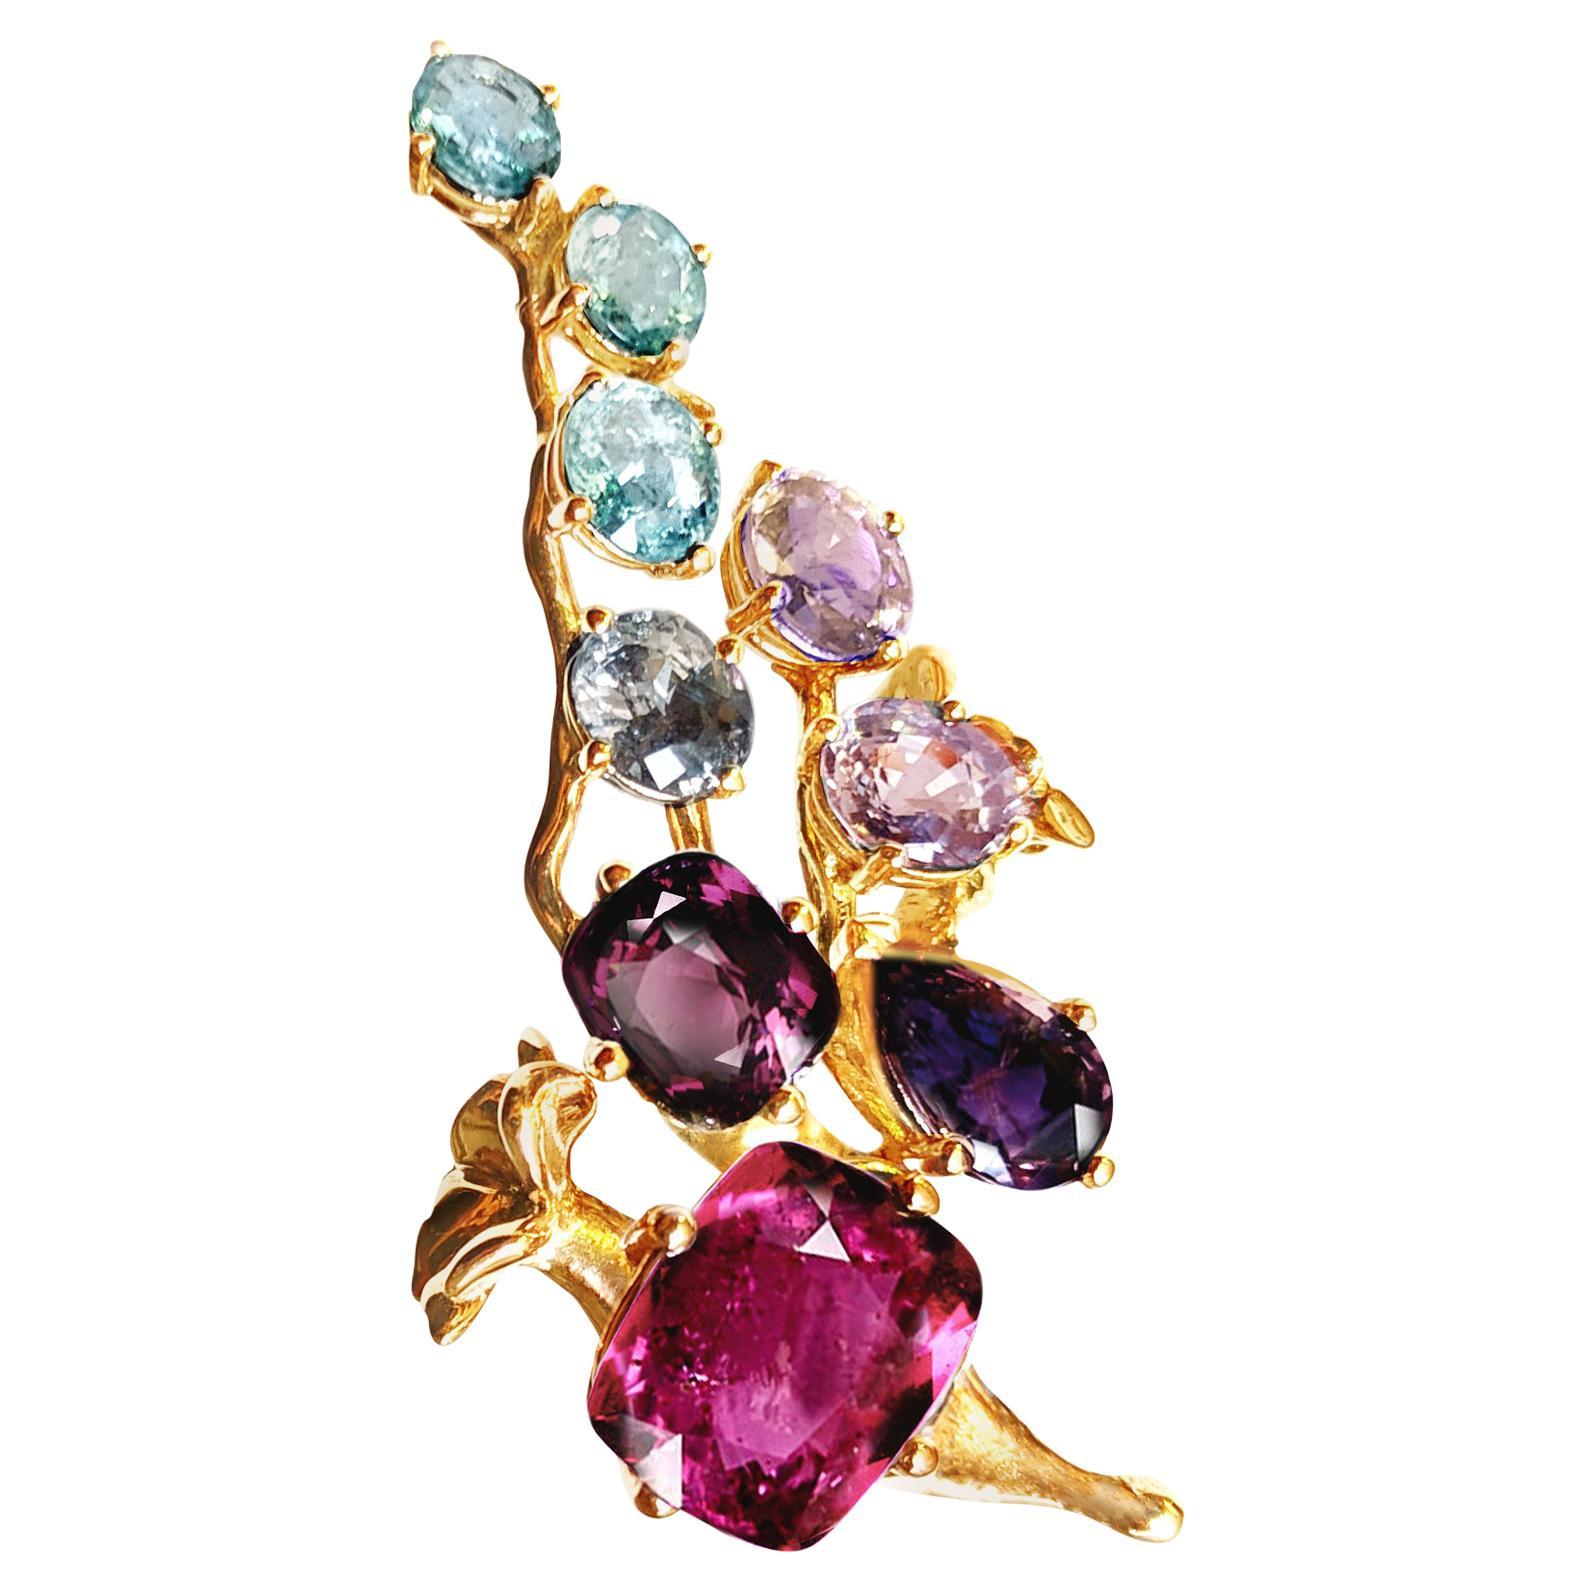 18 Karat Gold Cluster Brooch with 14 Carat Sapphires, and Paraiba Tourmalines